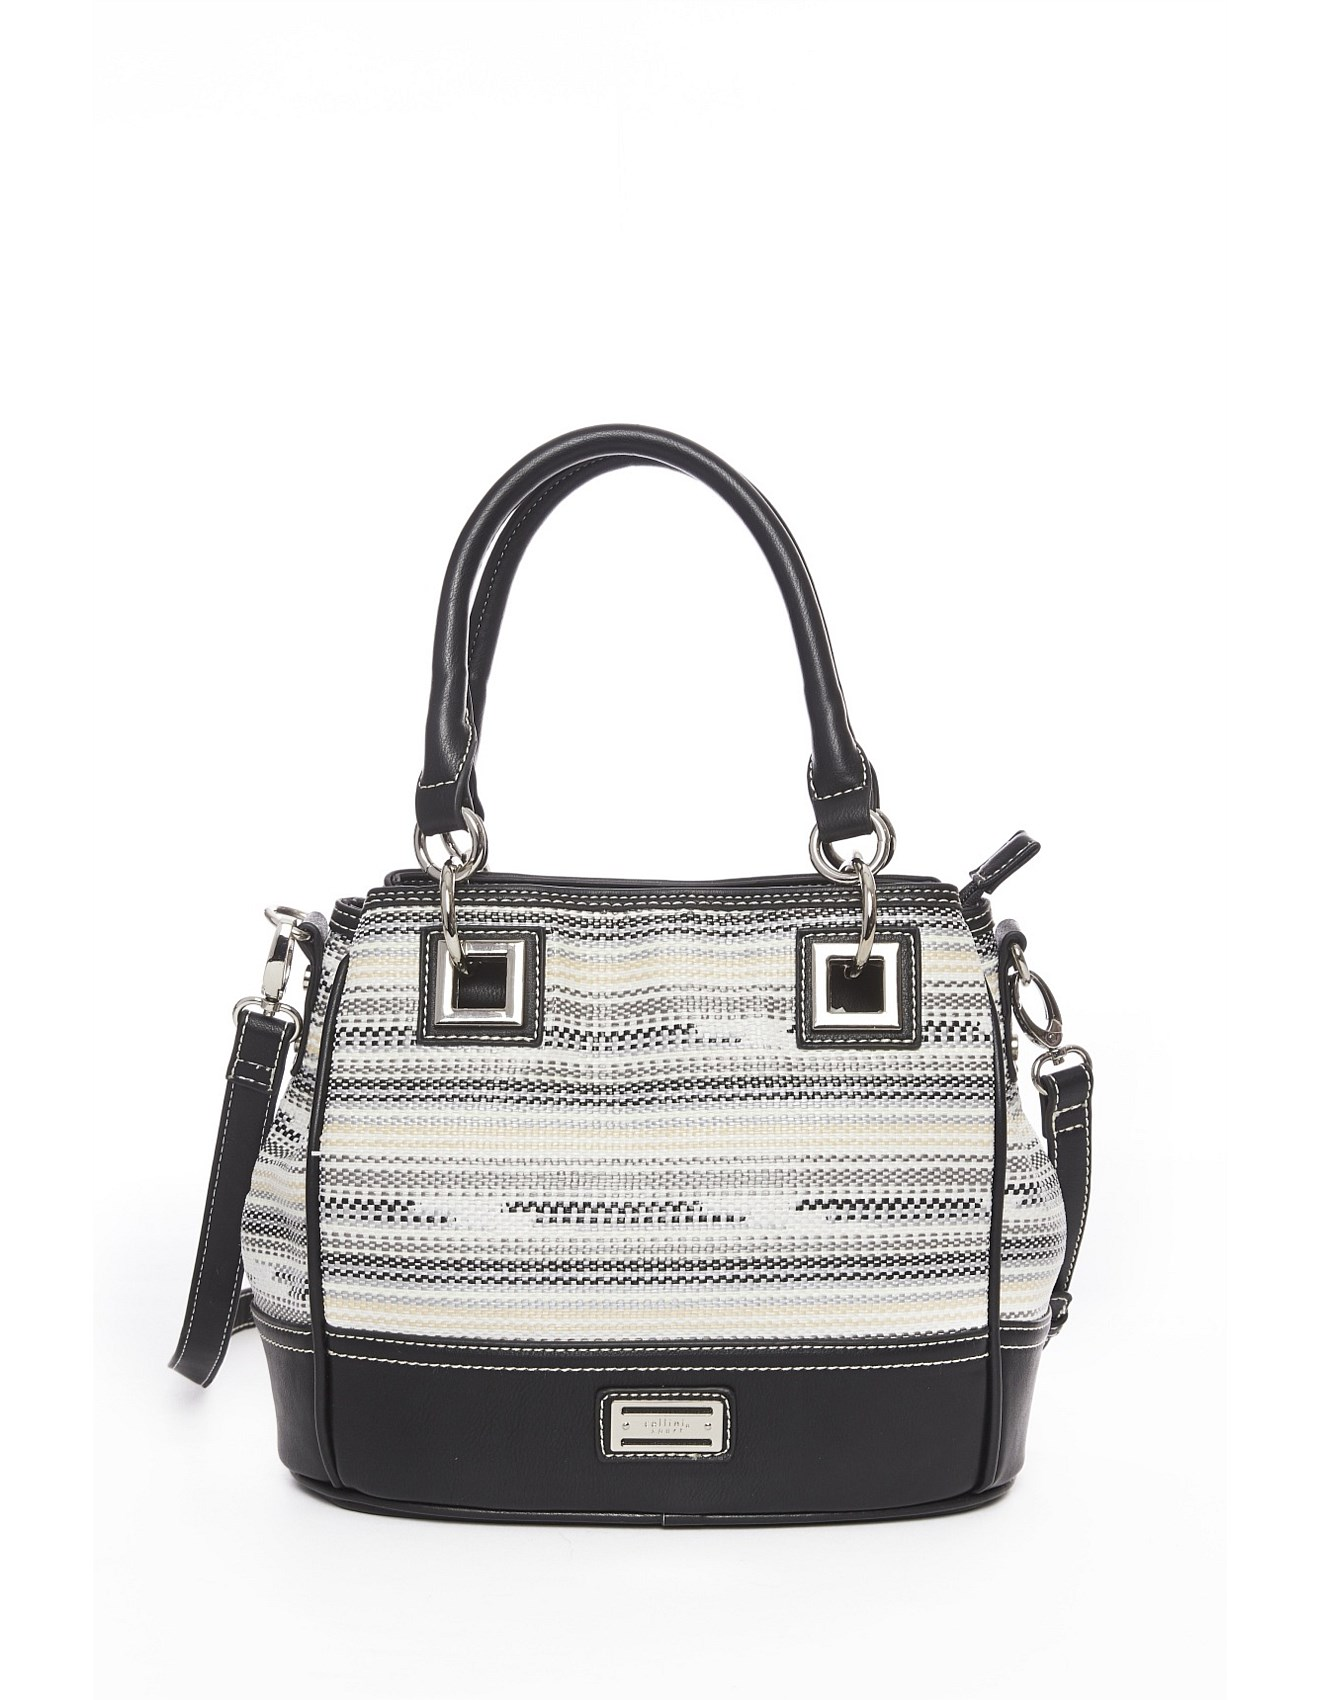 Cellini Sport Handbags Online David Jones Heidi Satchel